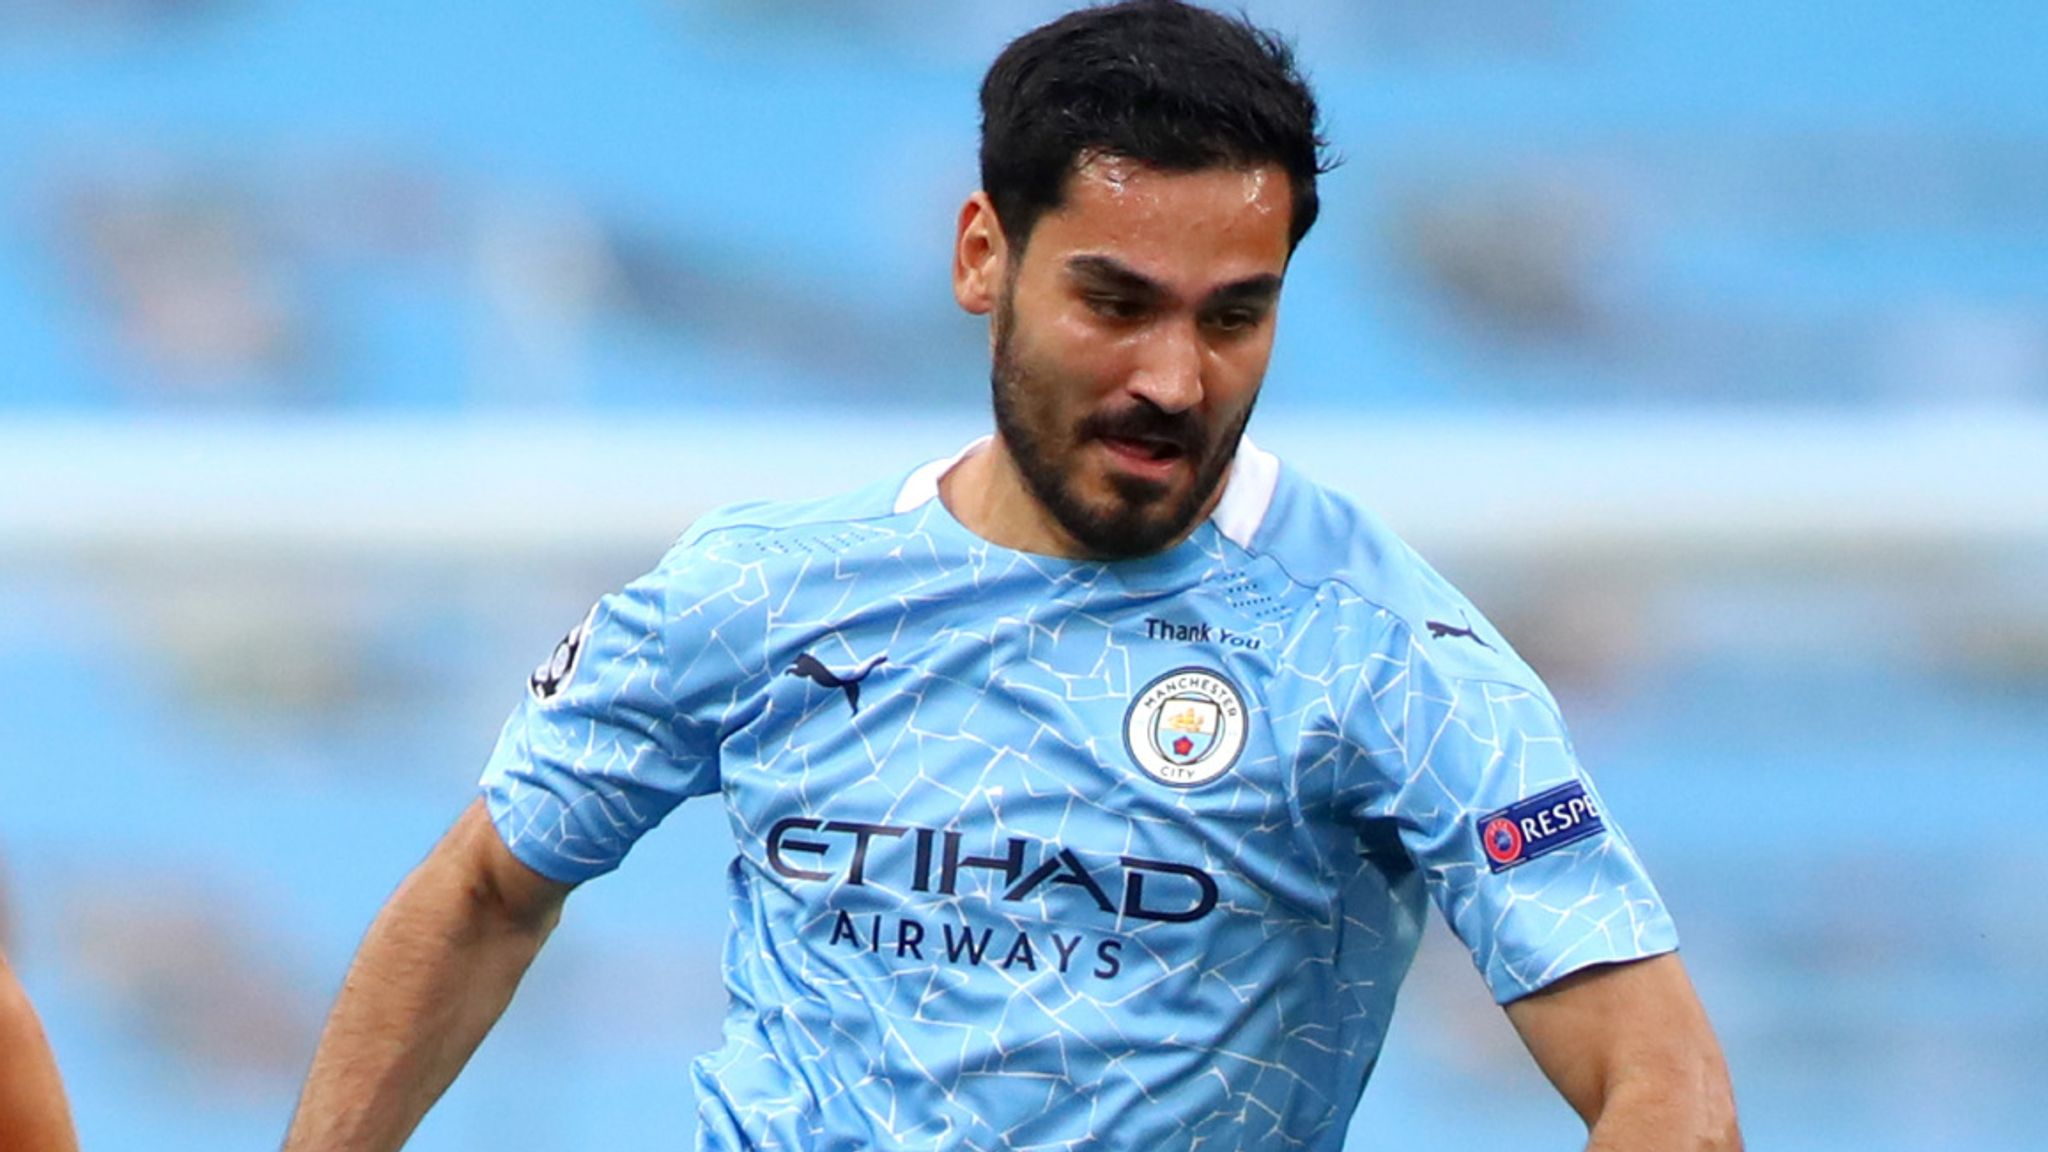 Coronavirus Manchester City S Ilkay Gundogan Tests Positive Football News Sky Sports